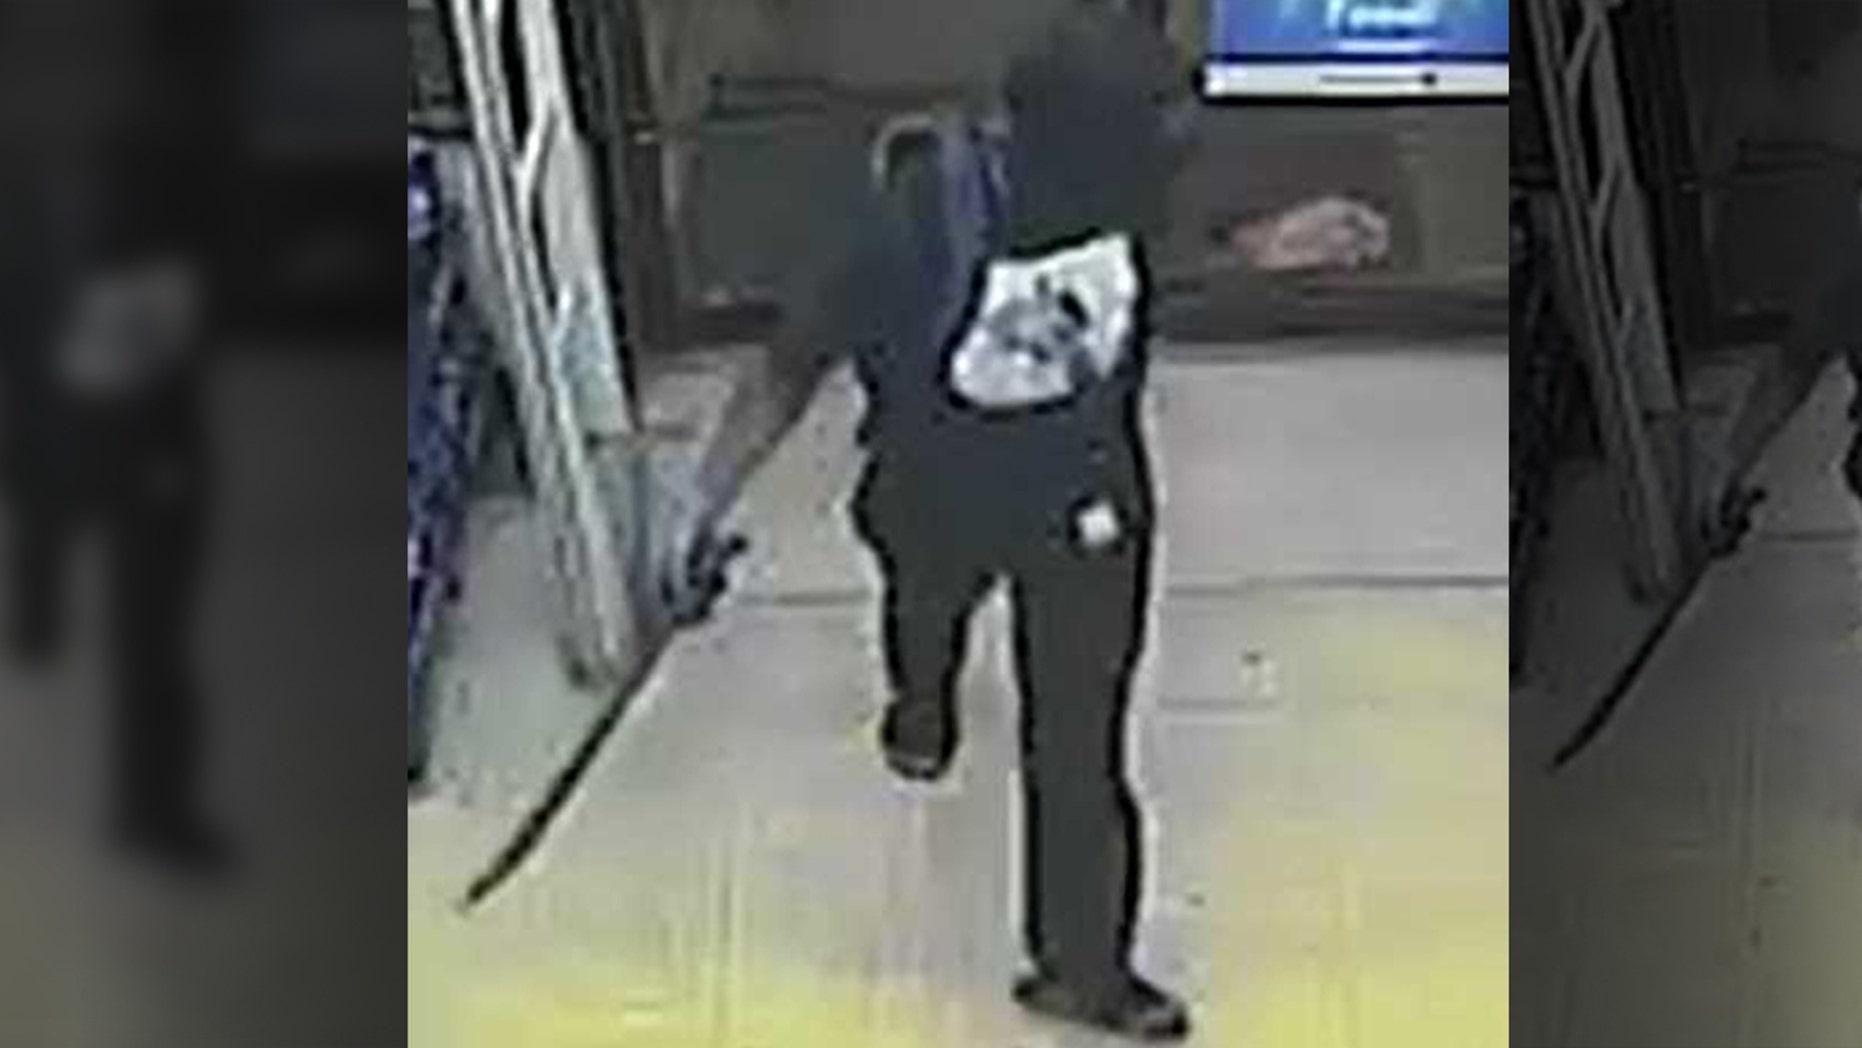 Two masked men burst into a Family Dollar in Birmingham, Ala., last week, police said.